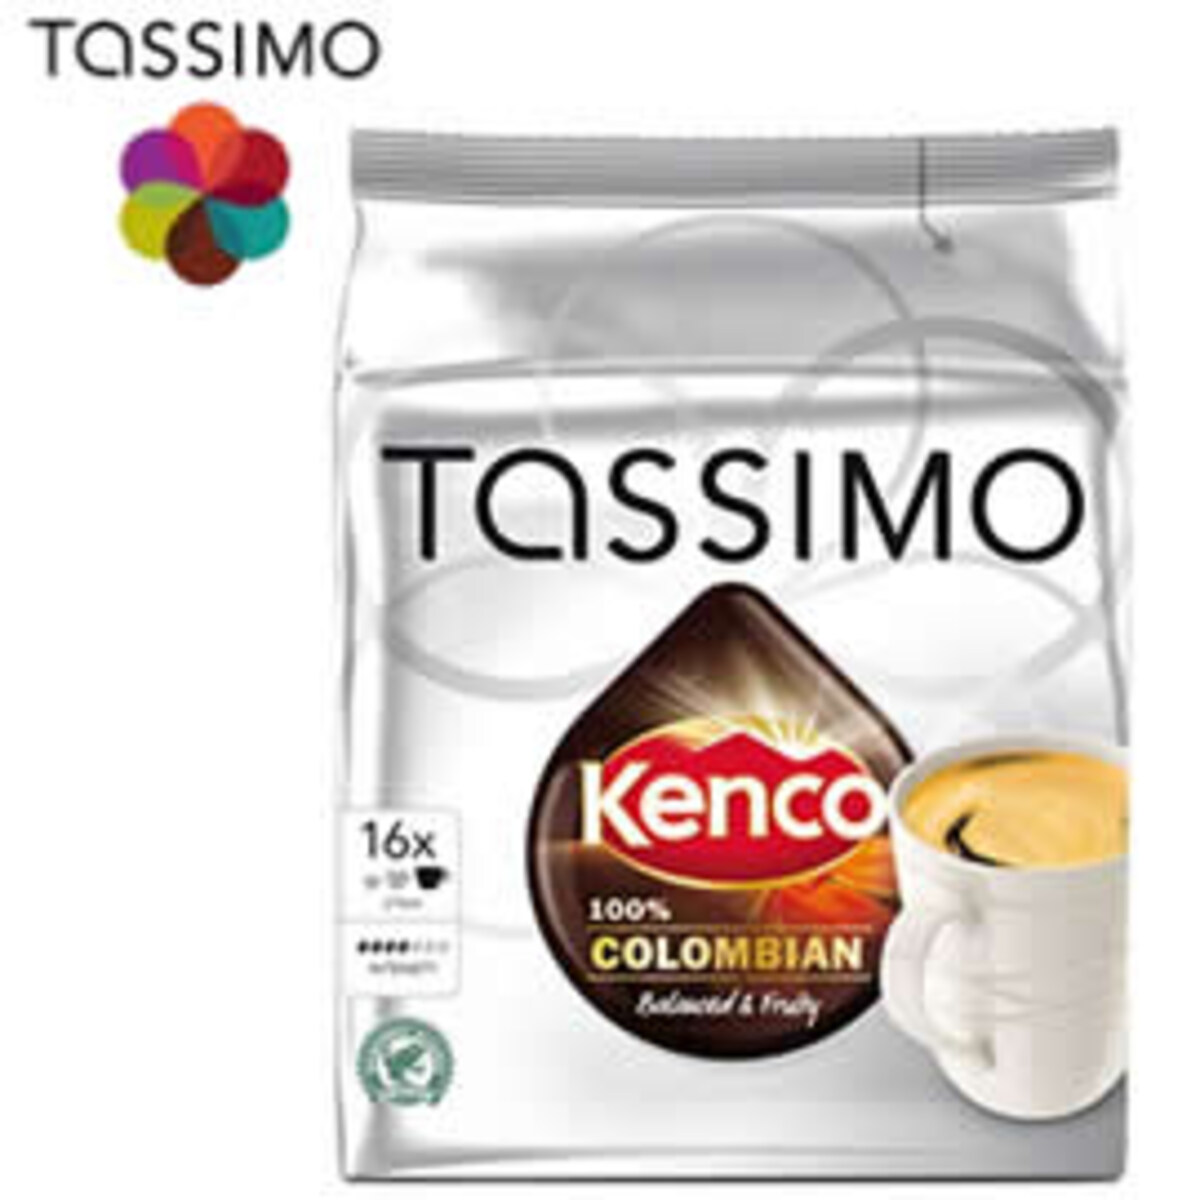 Tassimo Kenco Pure Colombian